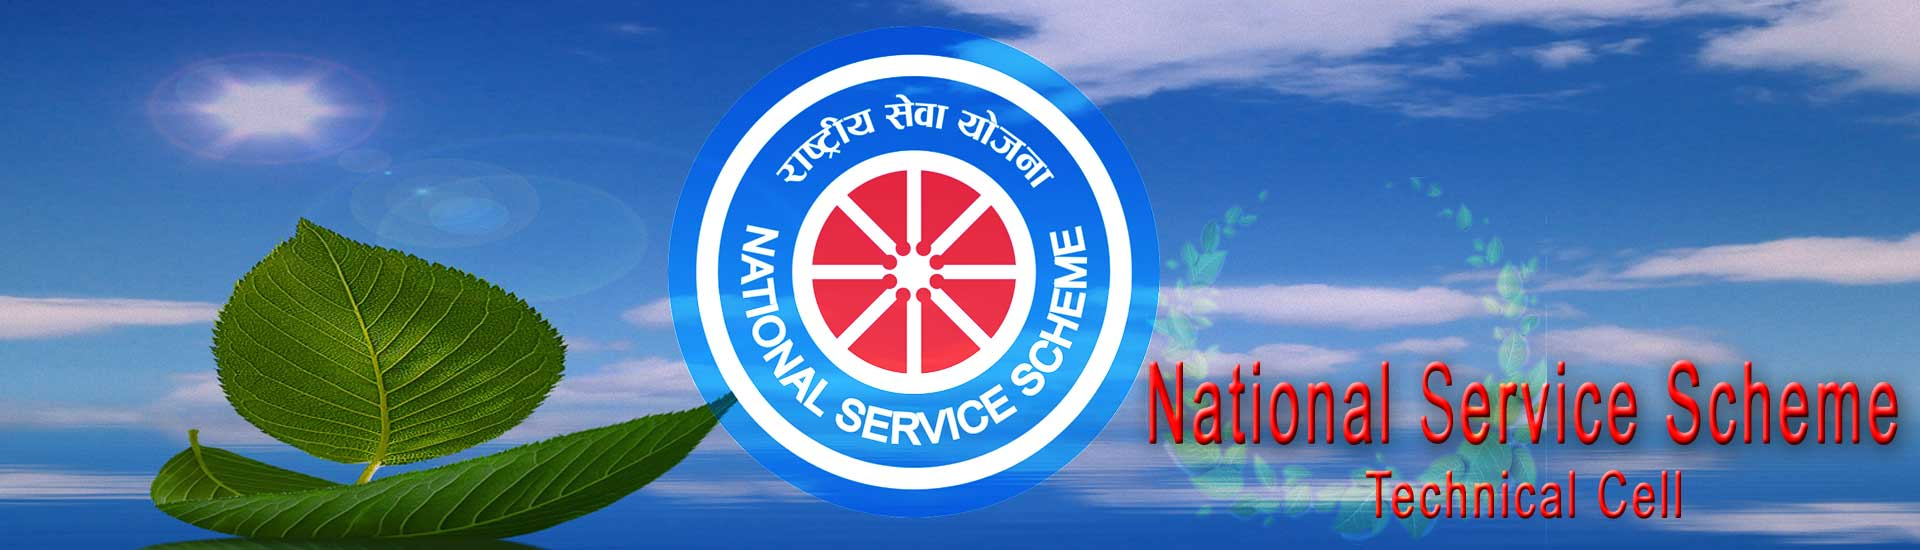 Essay about national service scheme